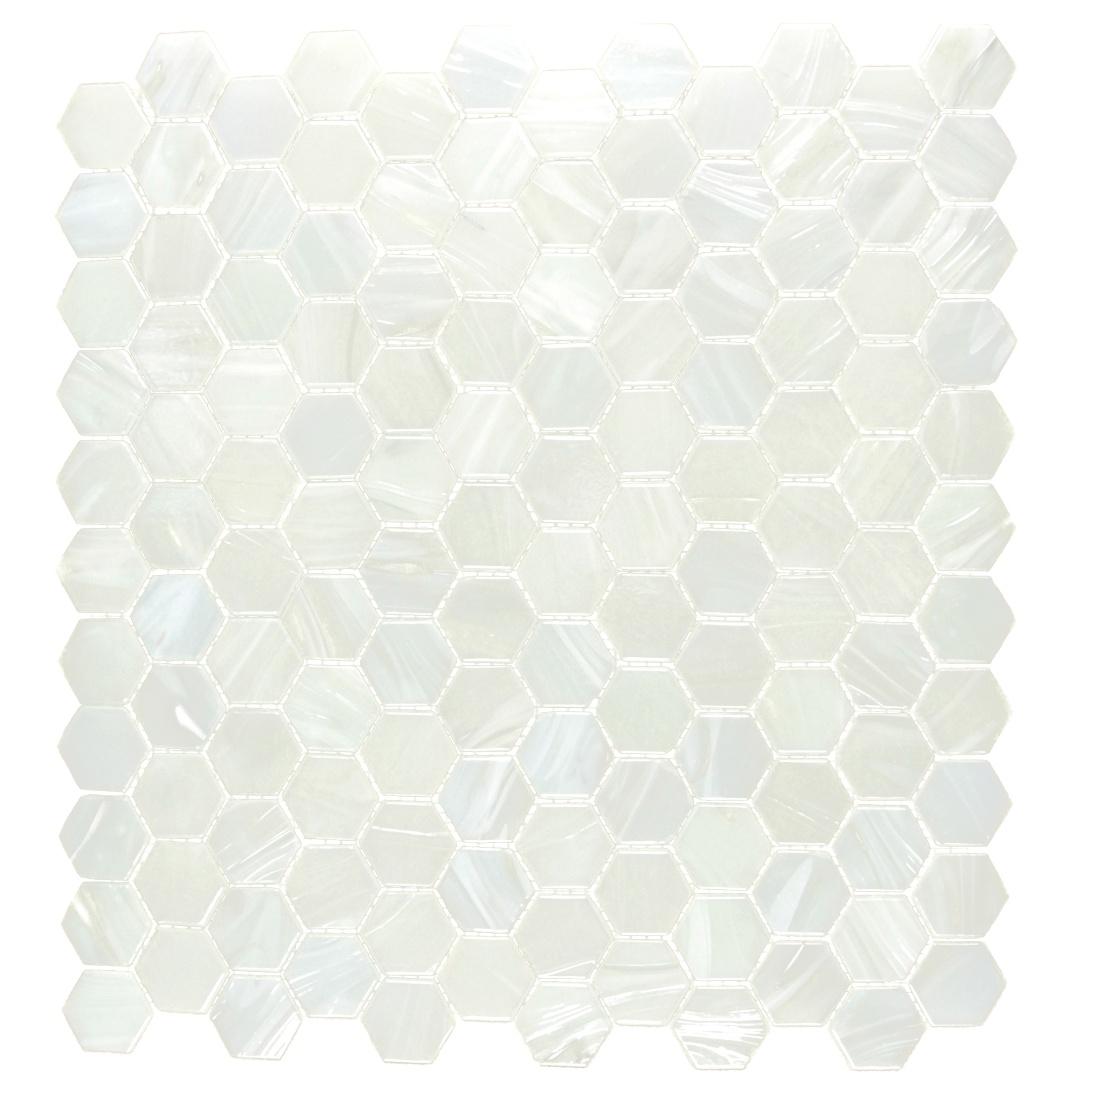 Pearl Diamond 1x1 Hexagon Collection Mosaic